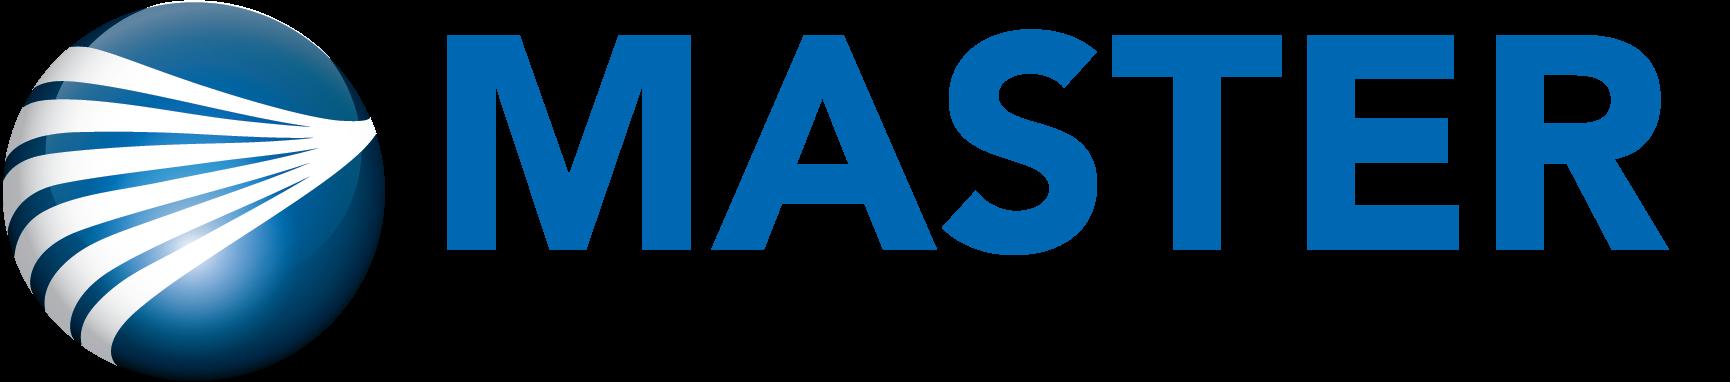 me-logo-blue-on-white.png